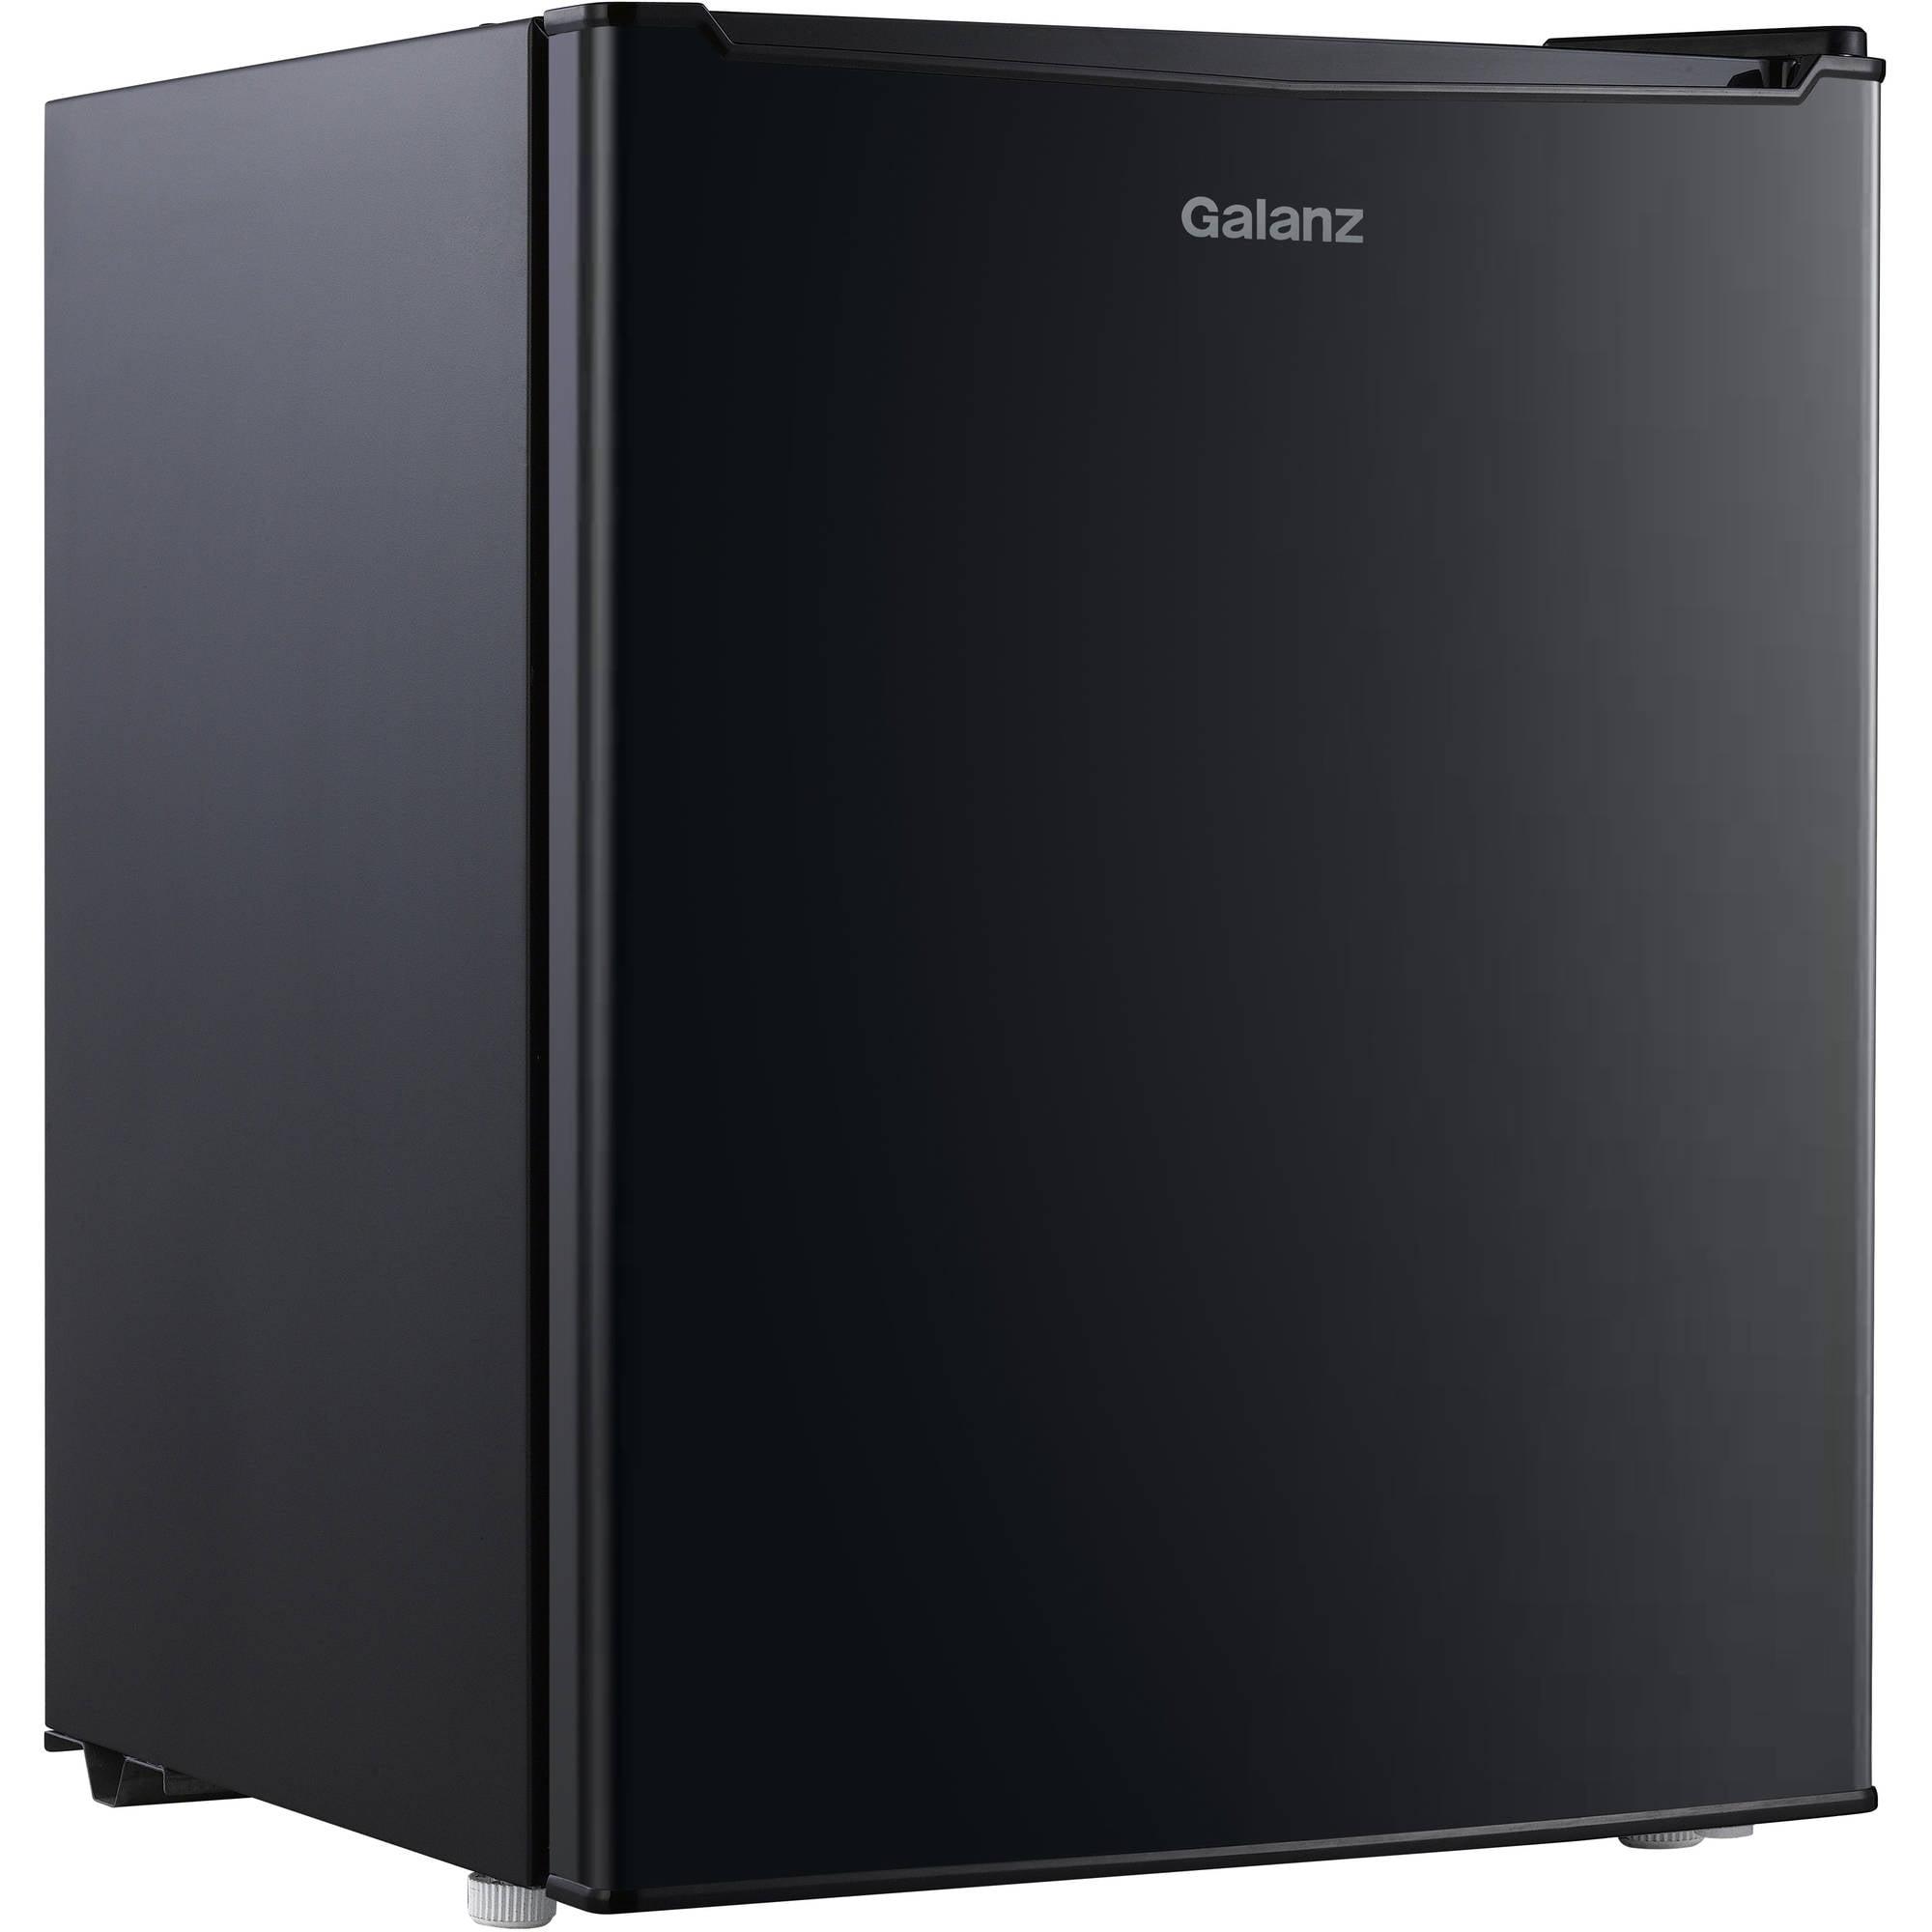 GALANZ 2.7 CU.FT. ONE DOOR REFRIGERATOR BLACK